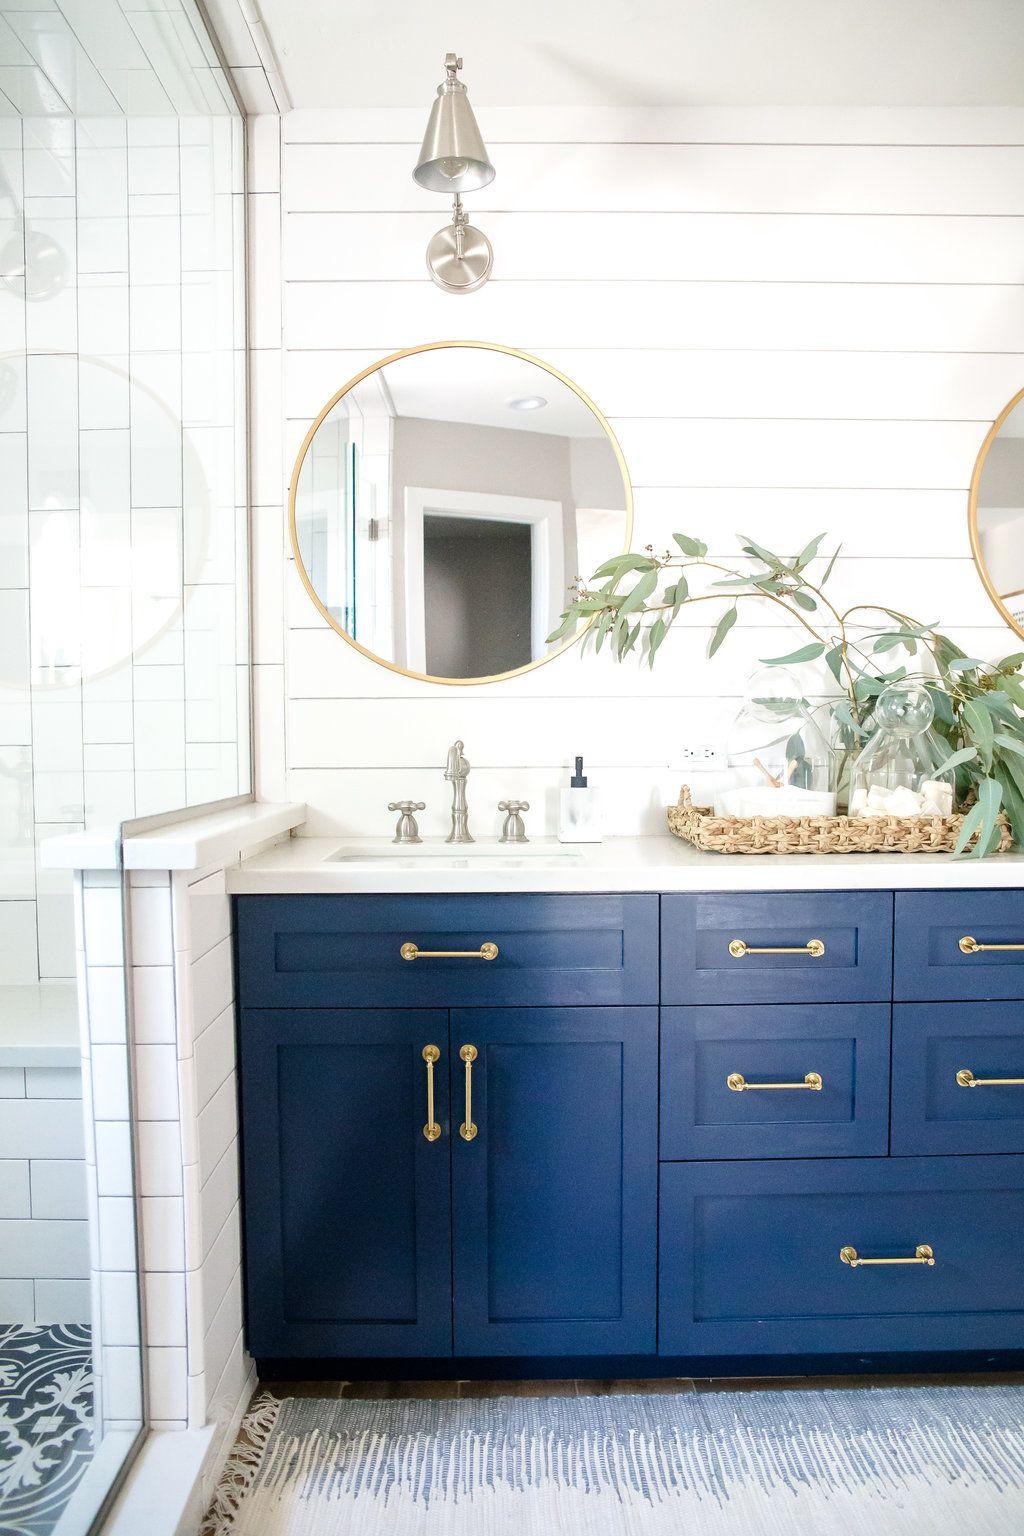 Casadeleeproject Bathroom Lead Design Lifestyledco Photos Natalieryanphotoaz Lifestyledco Blue Bathroom Vanity Diy Bathroom Farmhouse Bathroom